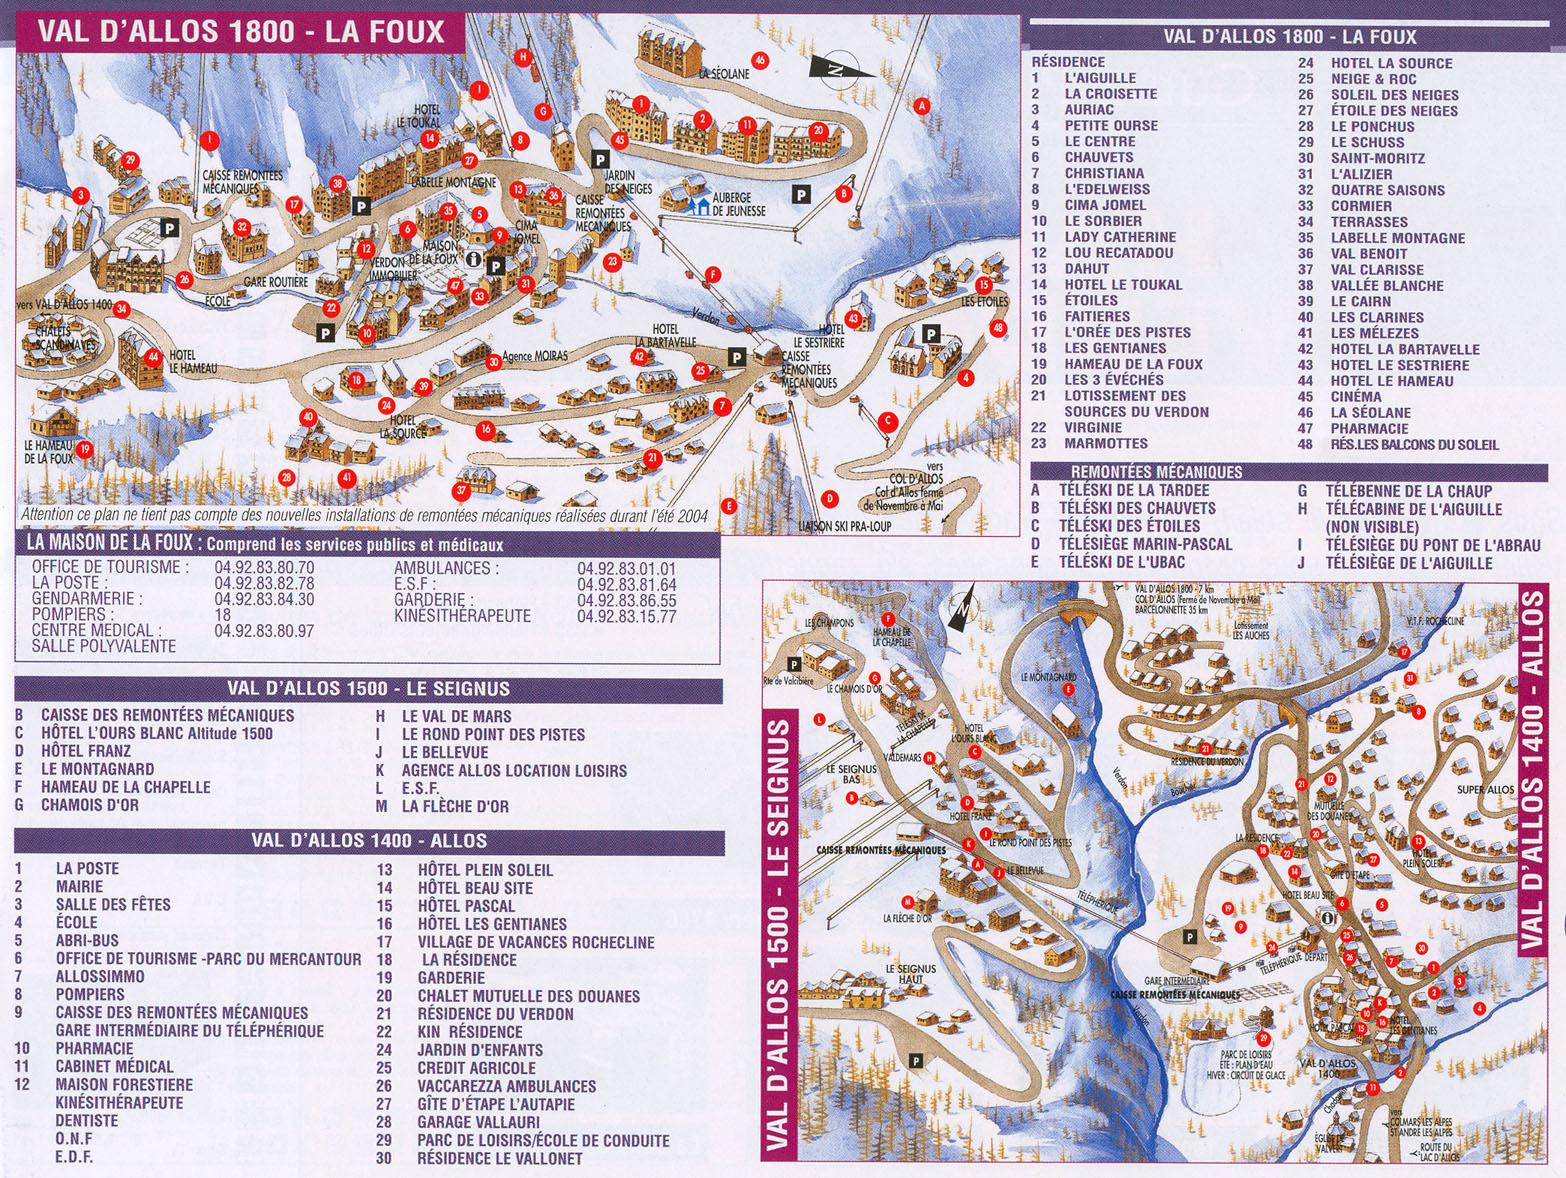 Plan d'accès Val d'Allos